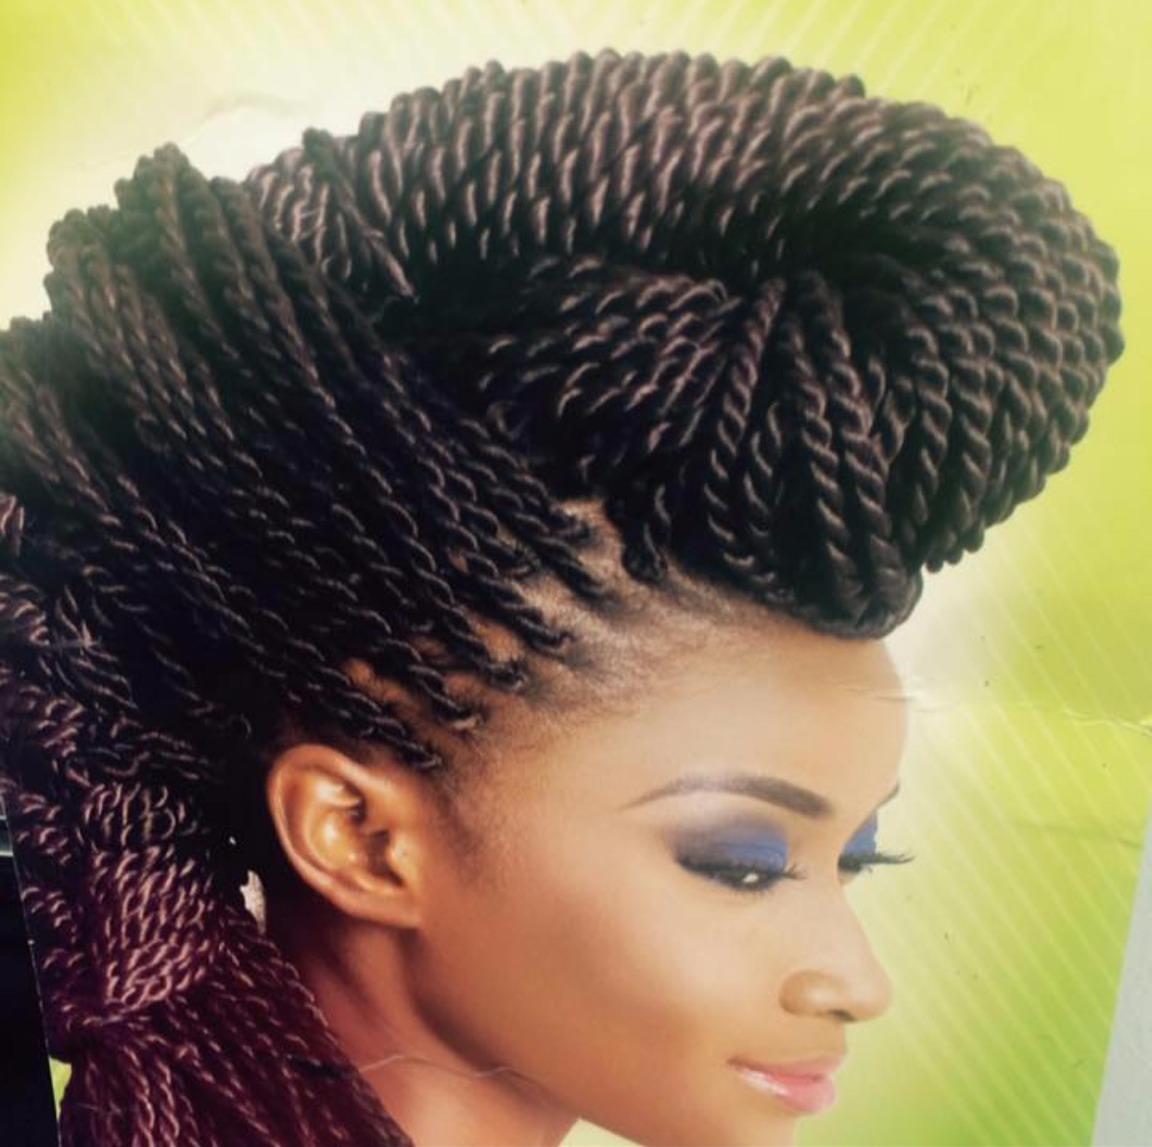 Hair Braiding Moma's Beauty Salon & Barber Shop image 31